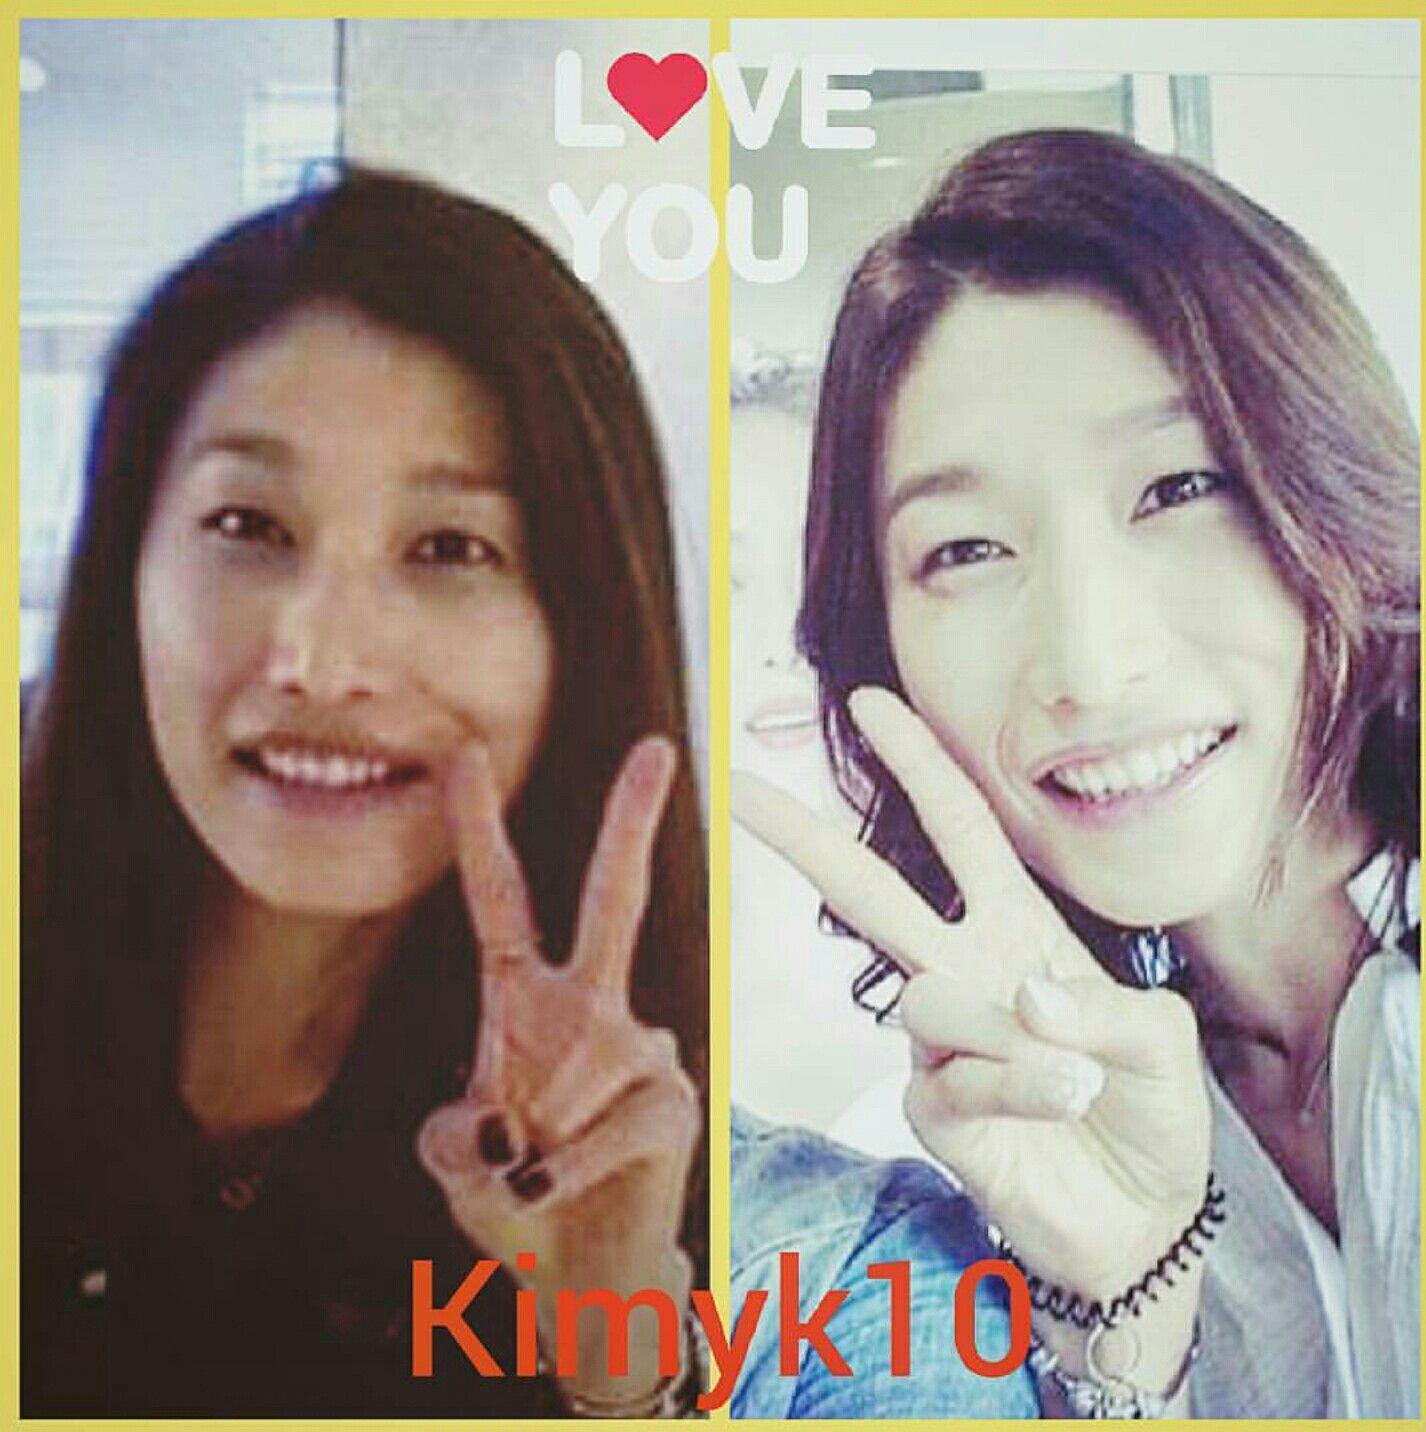 Kim yeon koung! 에 있는 Jemimah Gumpal님의 핀 선수, 배구